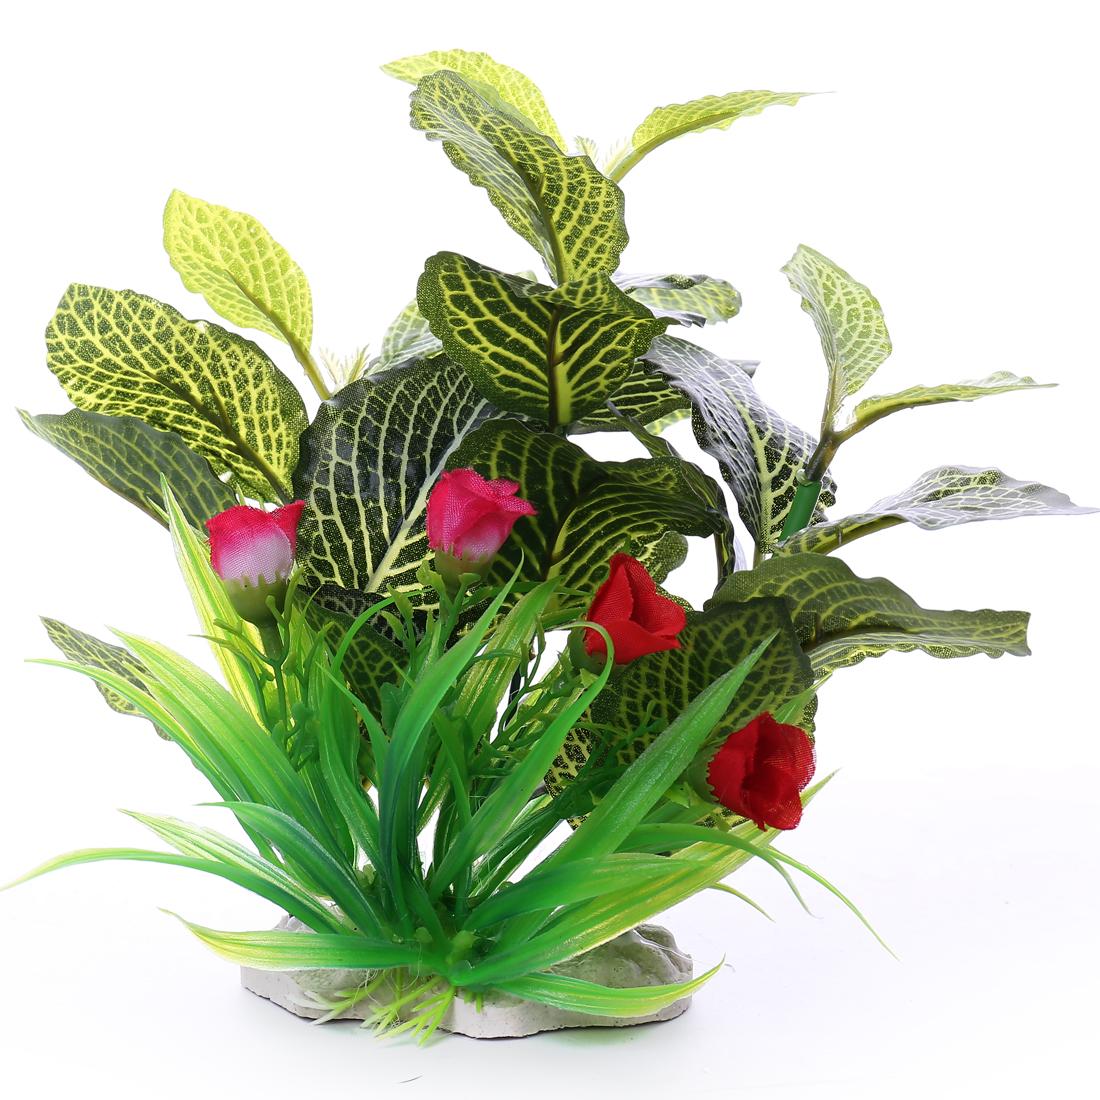 max 18cm long leaf Flower Aquarium Plants Fish Tank Plastic Decoration